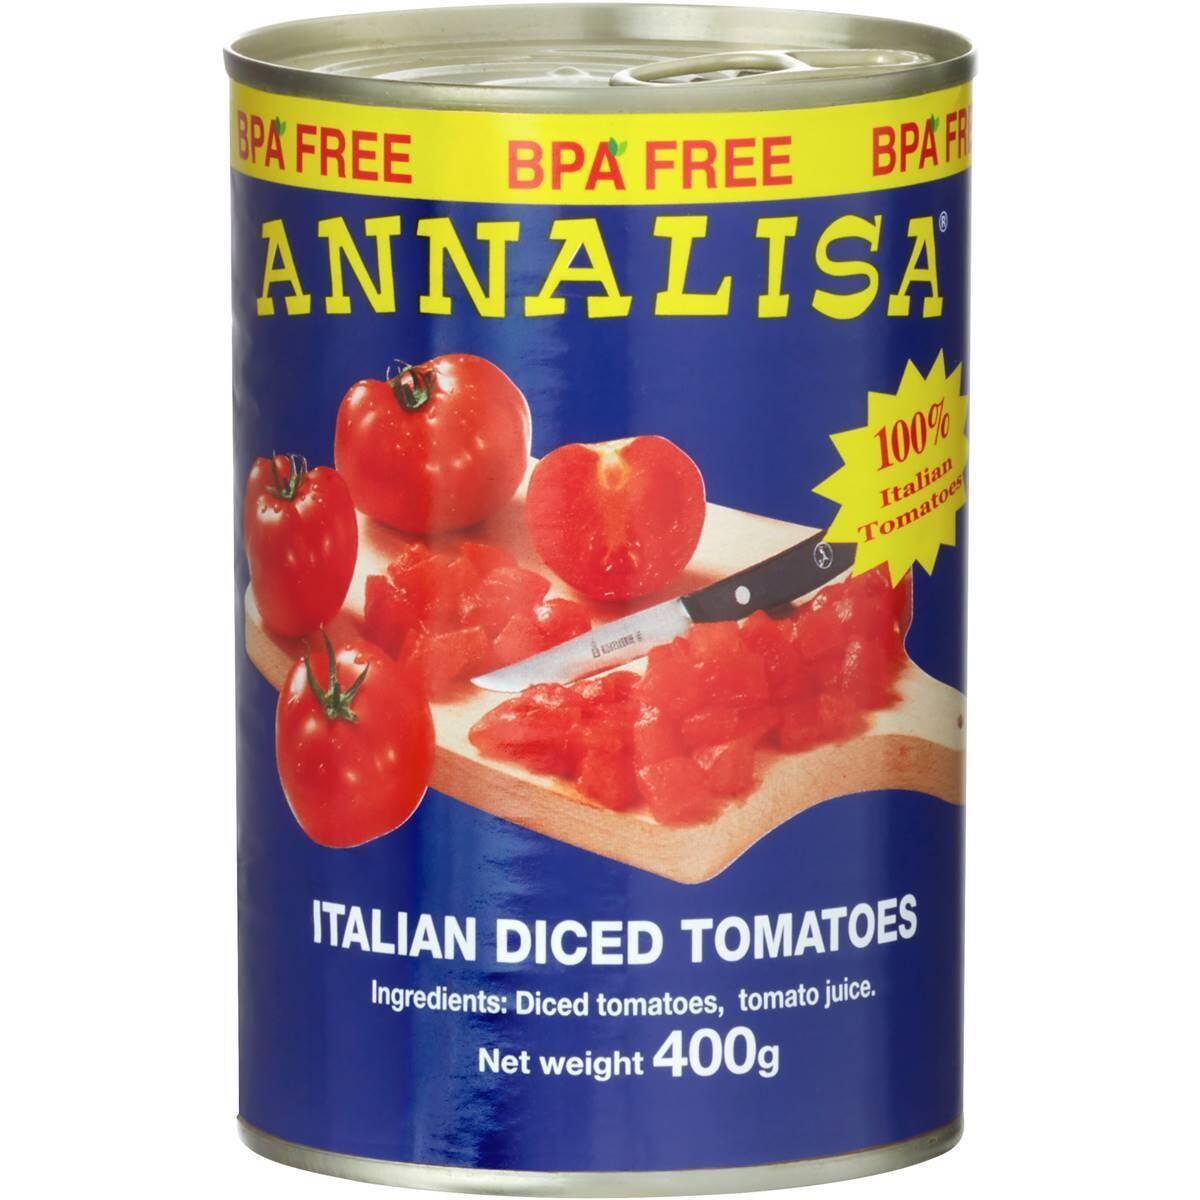 ANNALISA DICED TOMATO